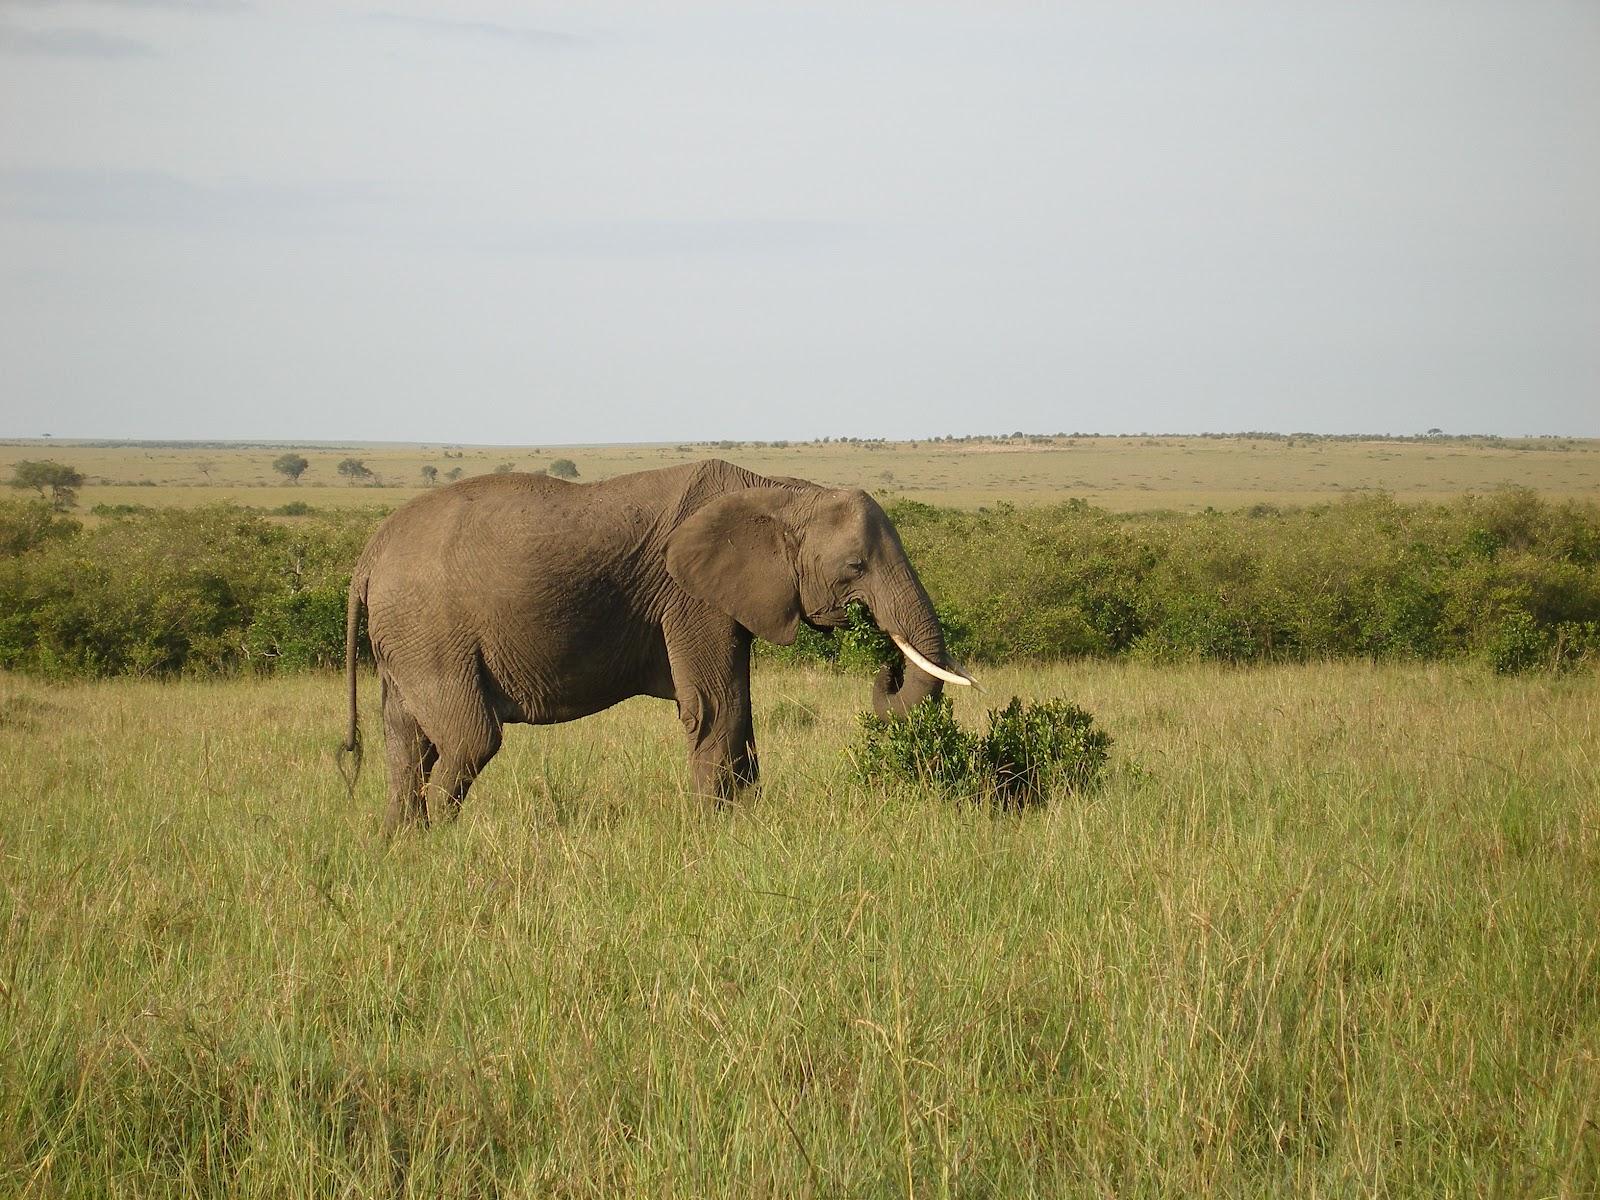 african elephants habitat - DriverLayer Search Engine